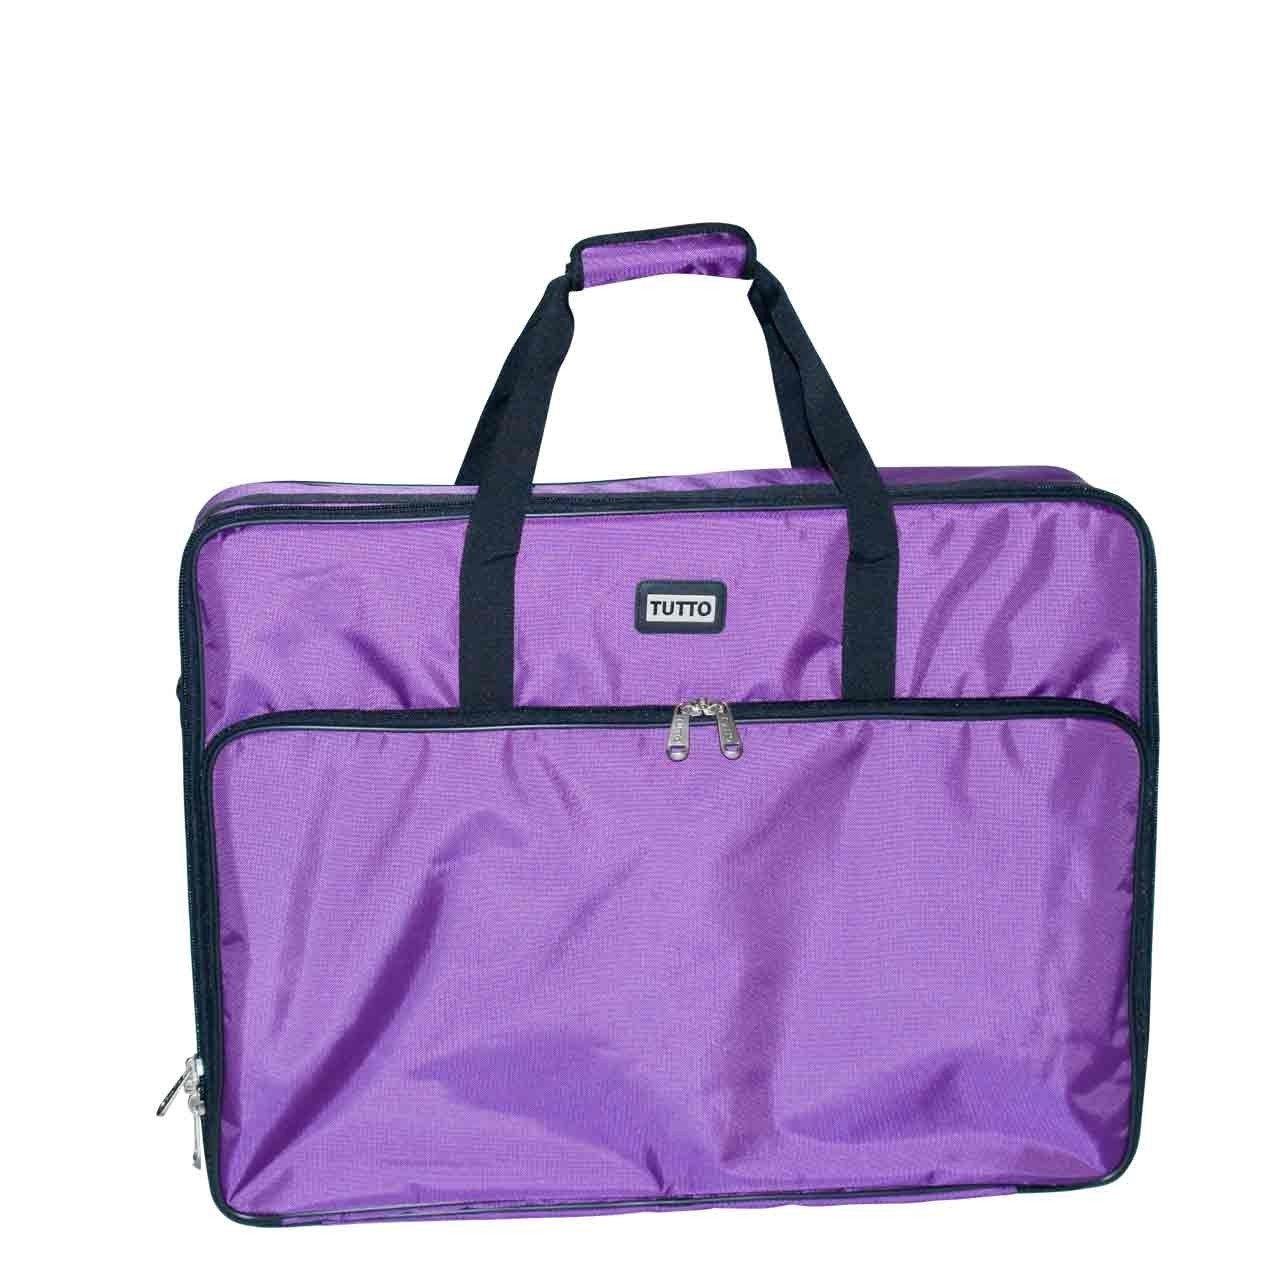 "Tutto 26"" Purple Embroidery Project Bag"